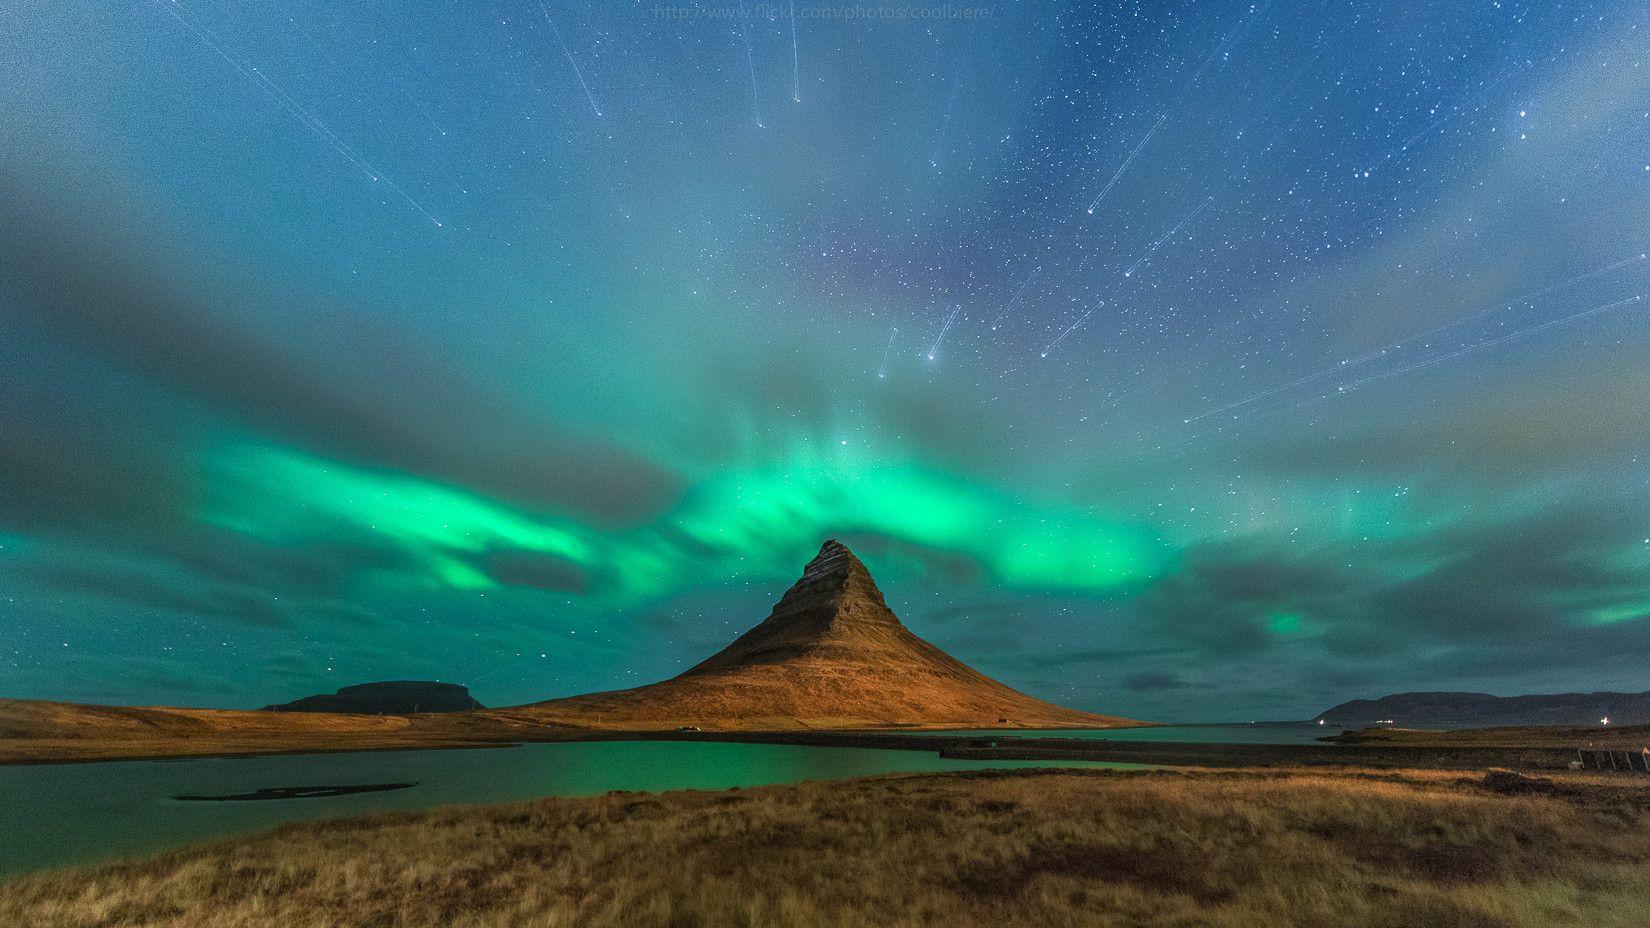 Starburst over Aurora Borealis in Iceland